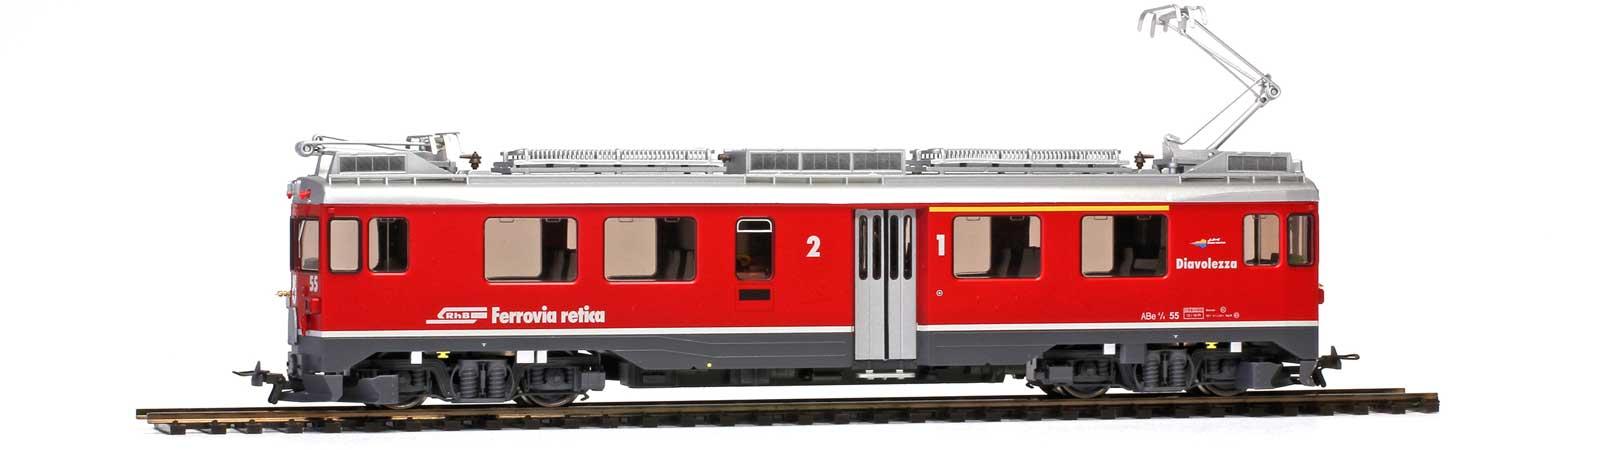 BEMO Bernina 1269 115 RhB ABe 4/4 55 'Diavolezza' Berninatriebwagen ¥44,700